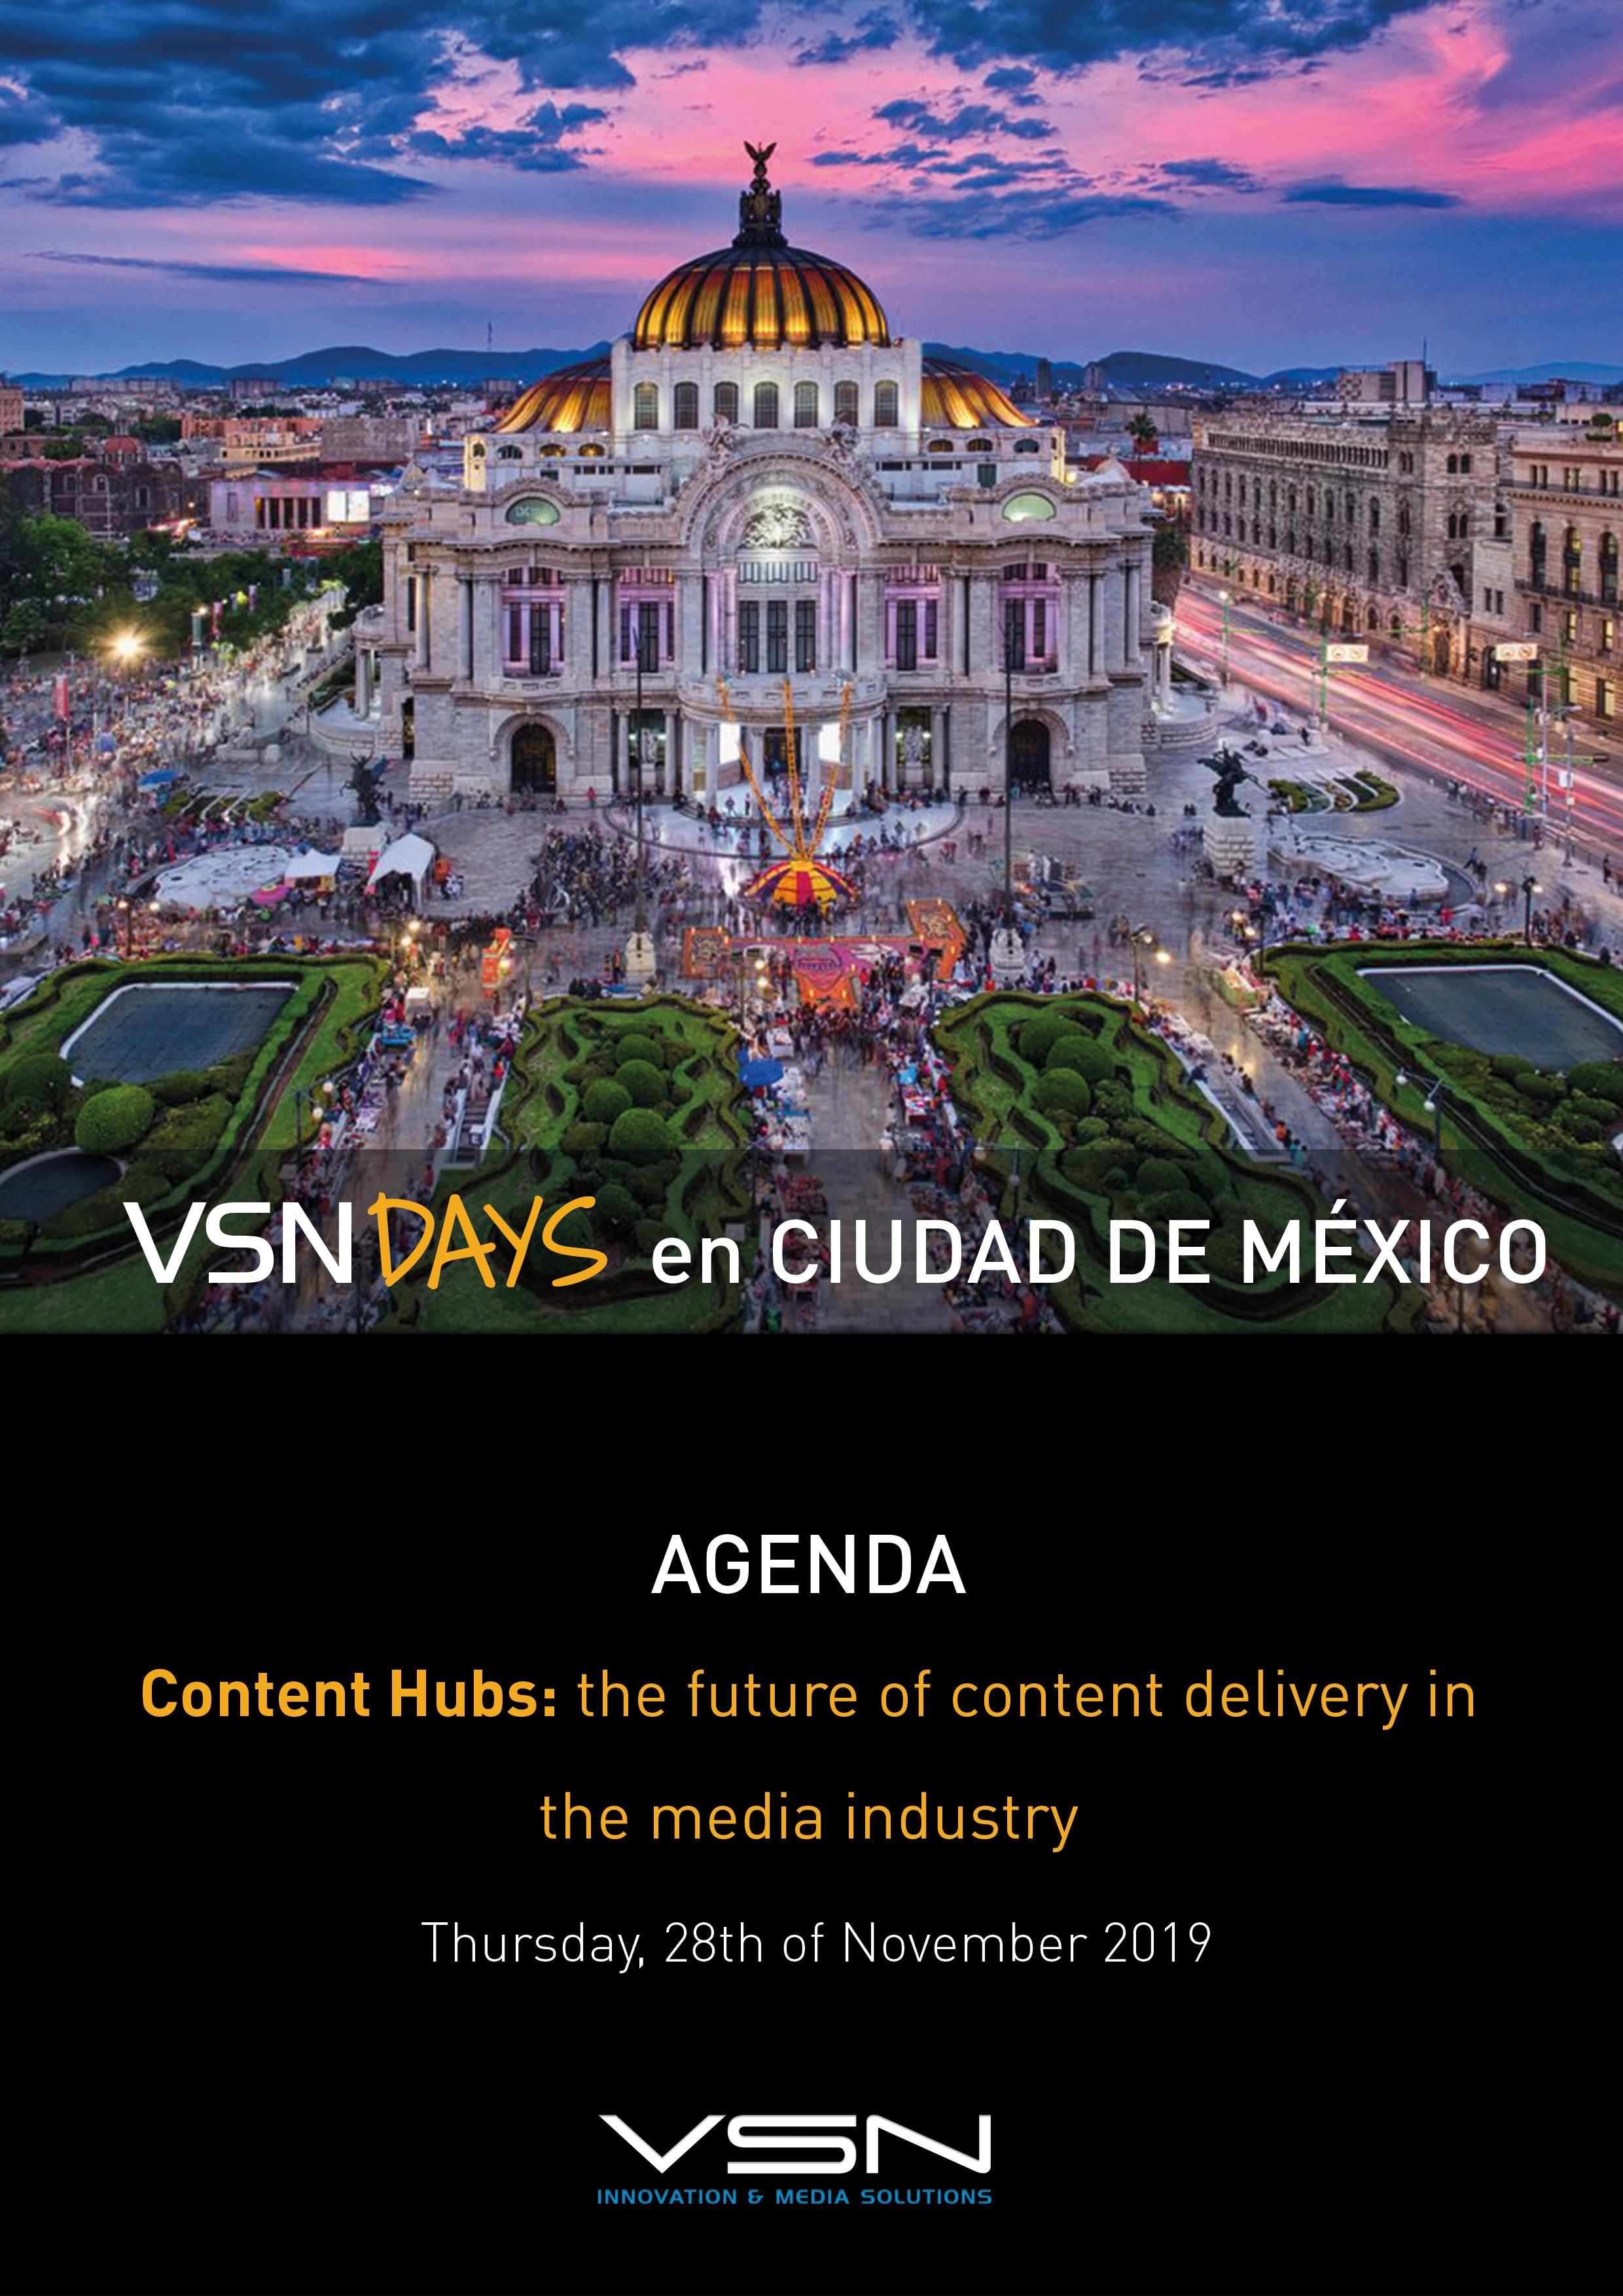 VSNDAYS-Mexico-Agenda